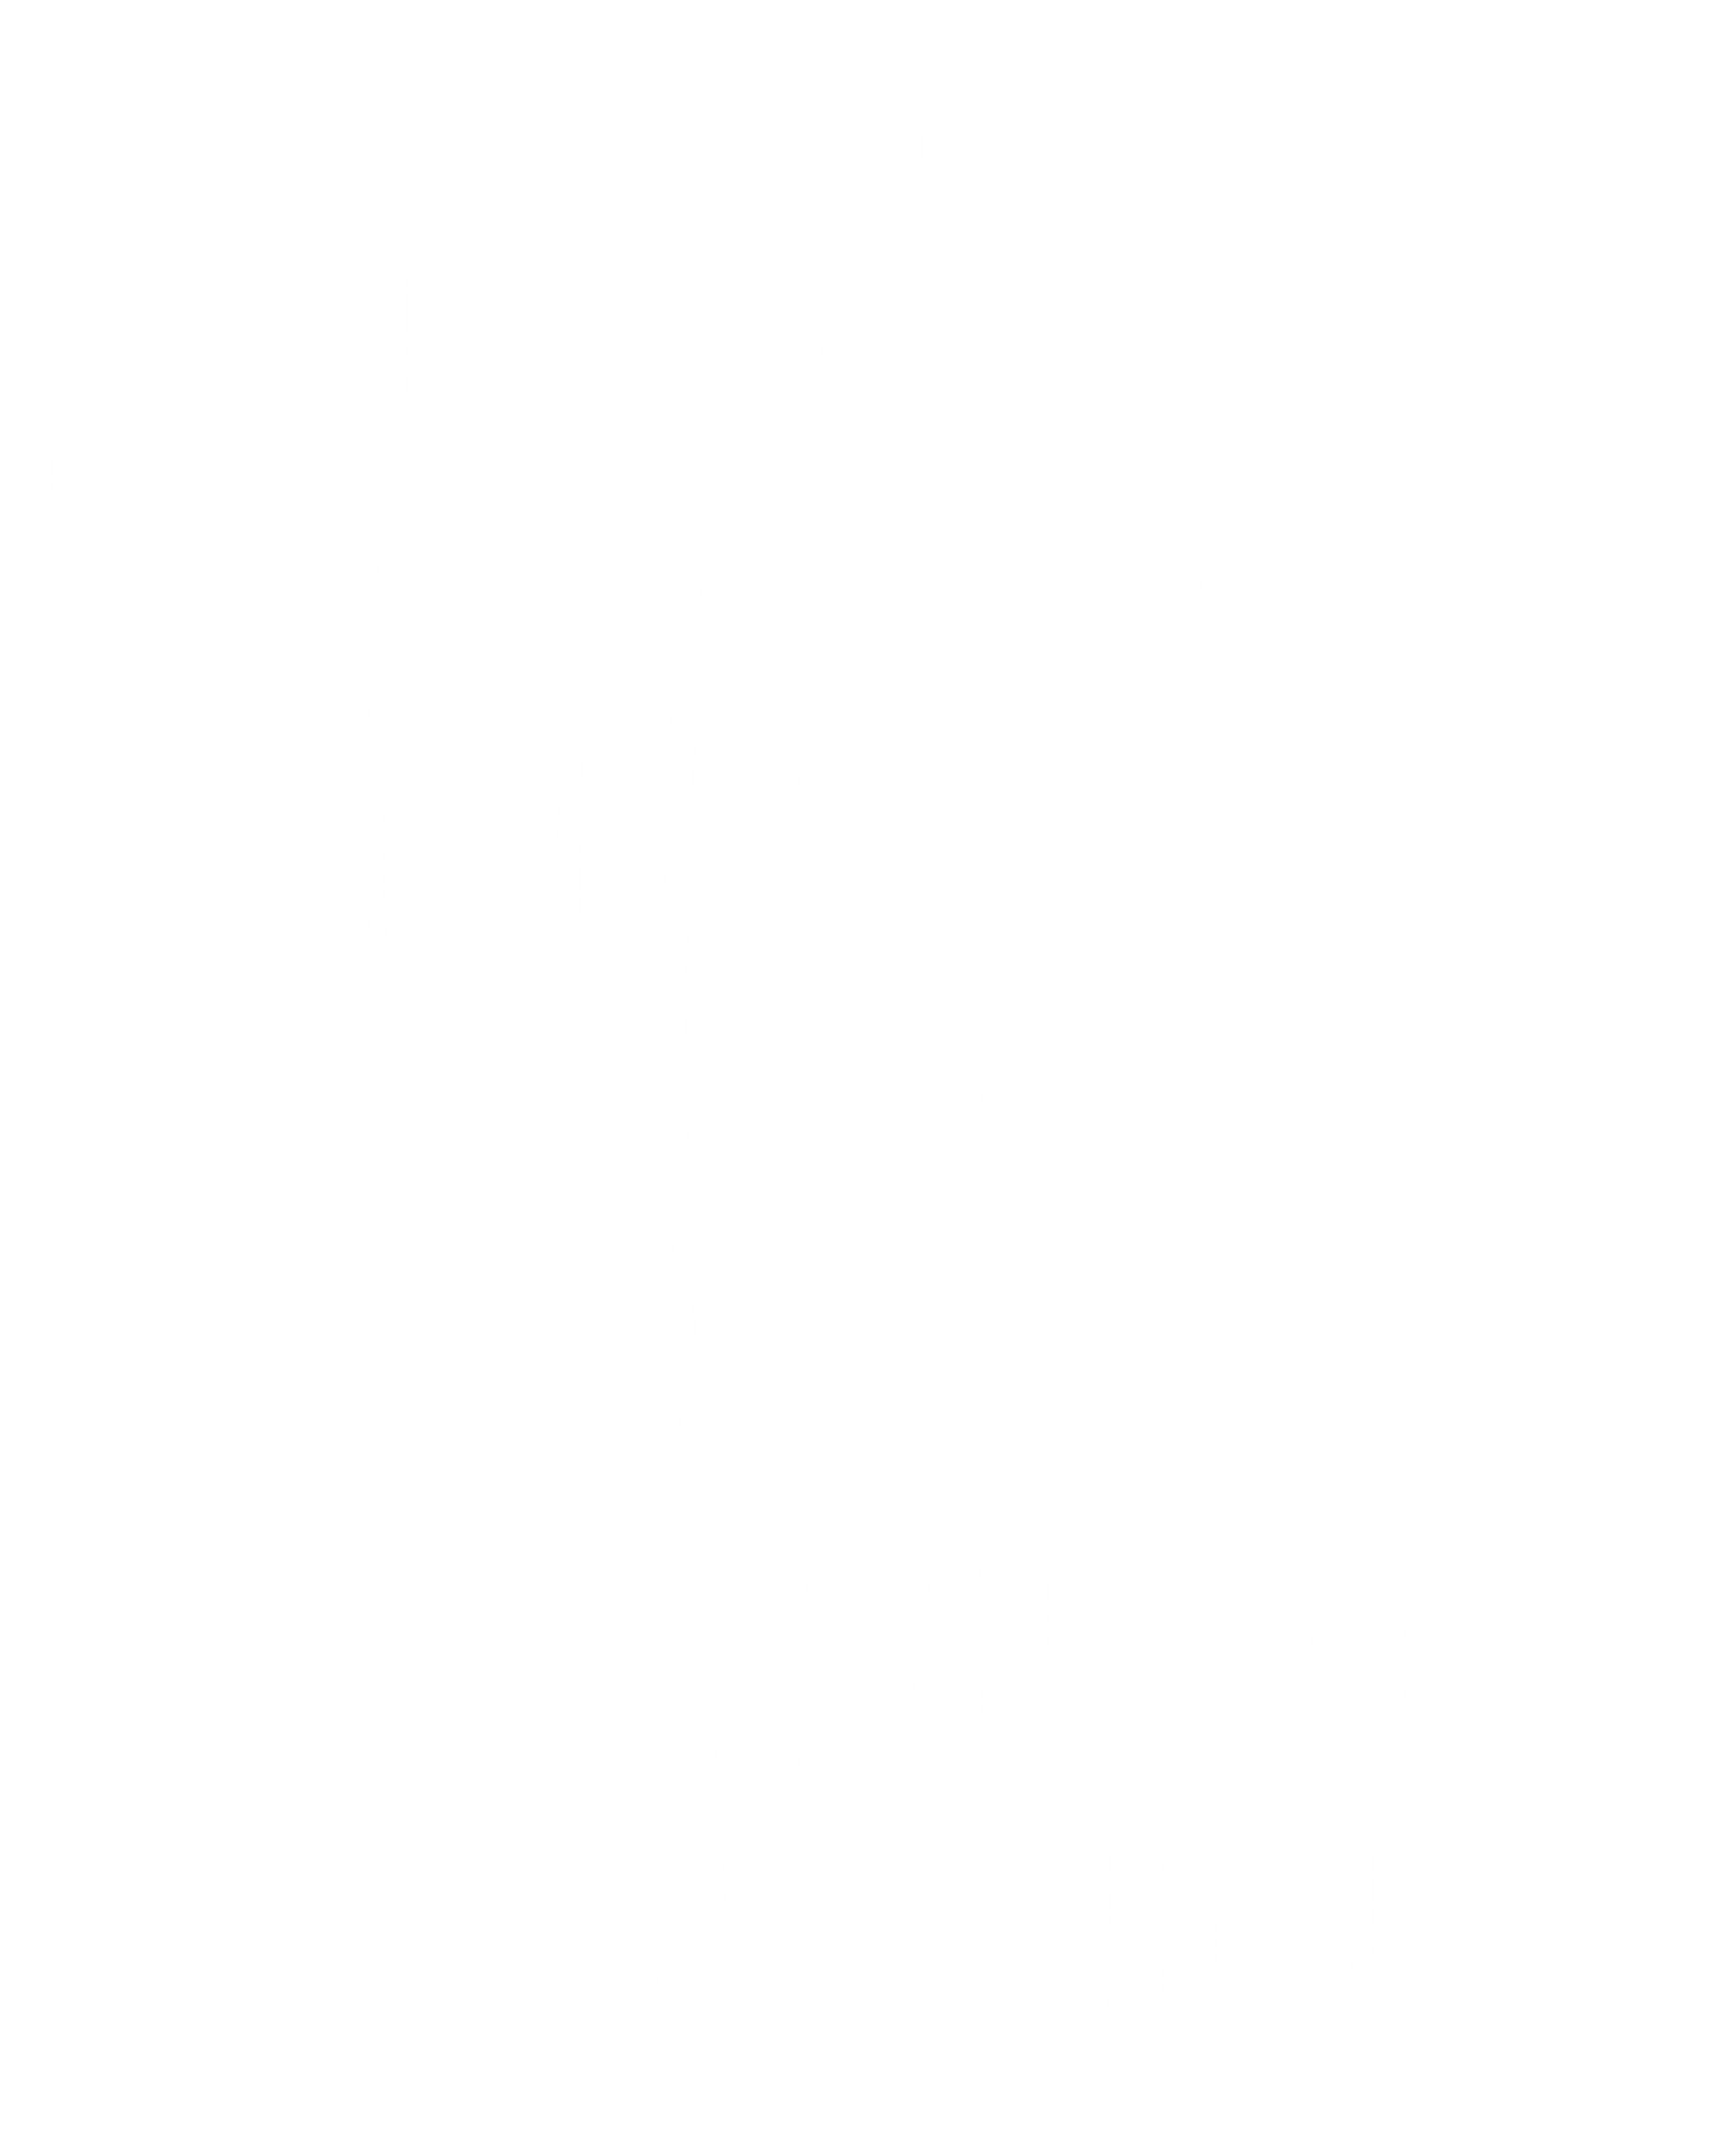 TYLOS Muzikos Studija logo